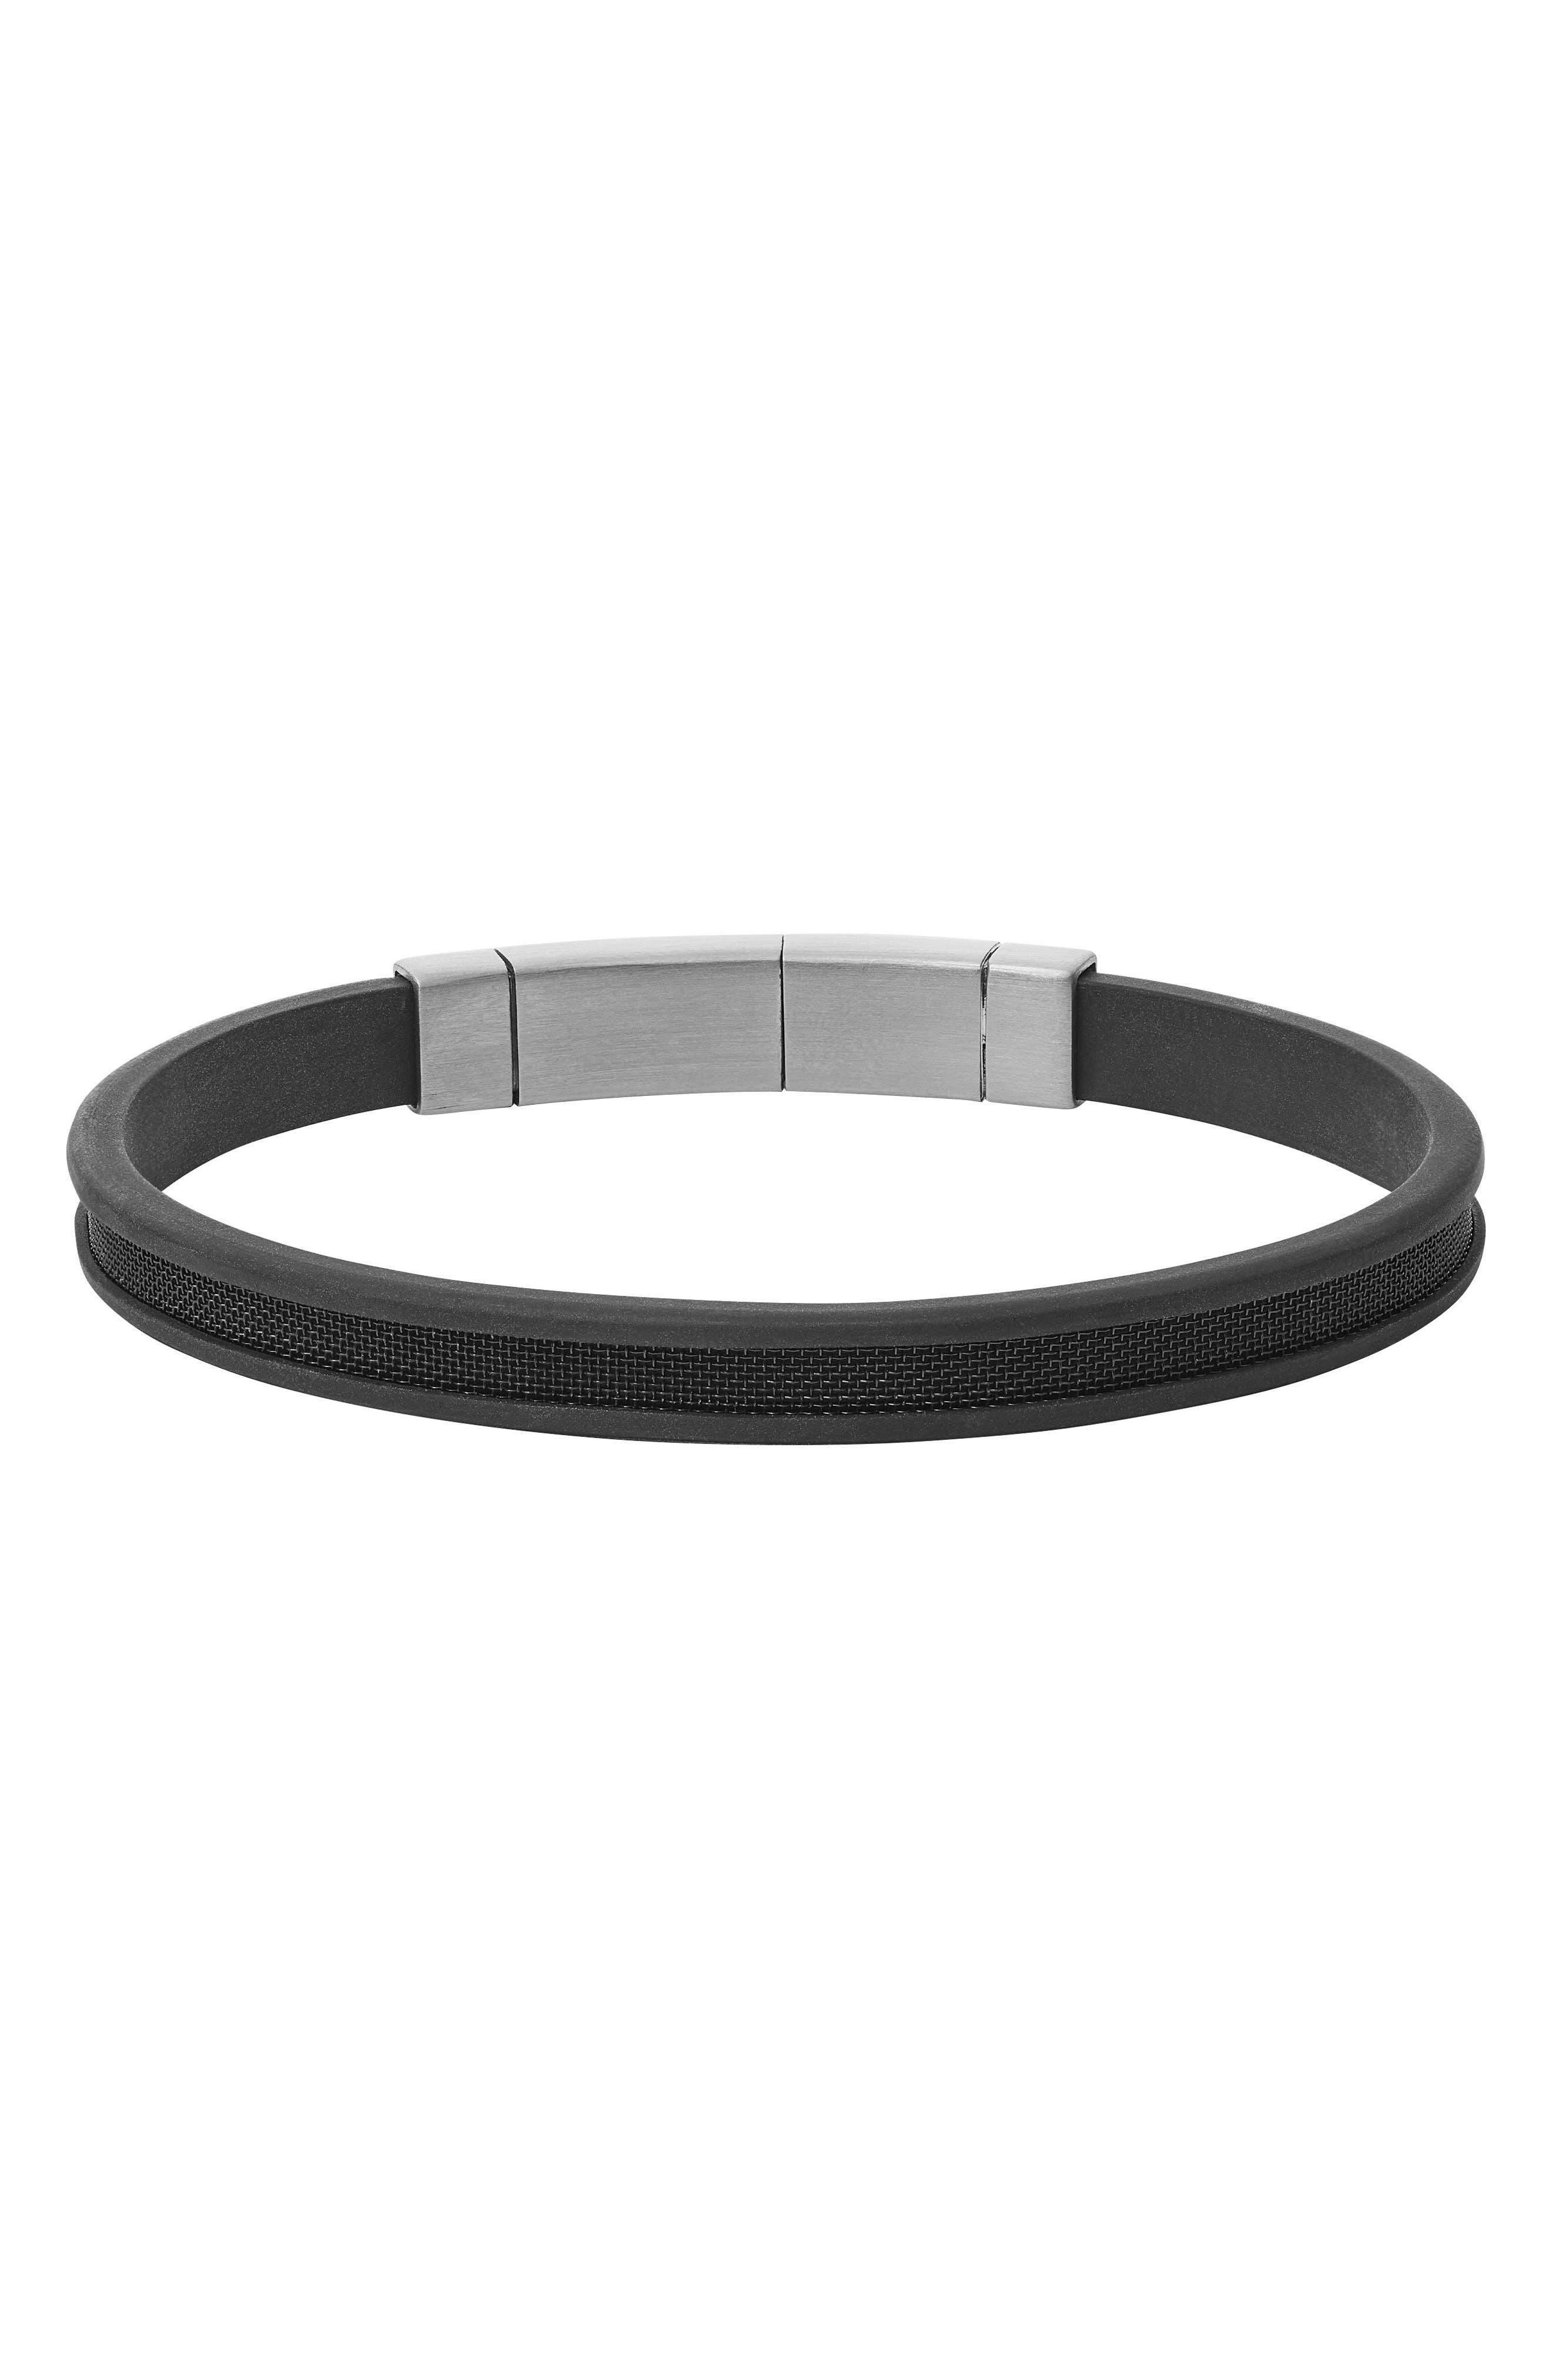 Kring Bracelet,                         Main,                         color, Multi